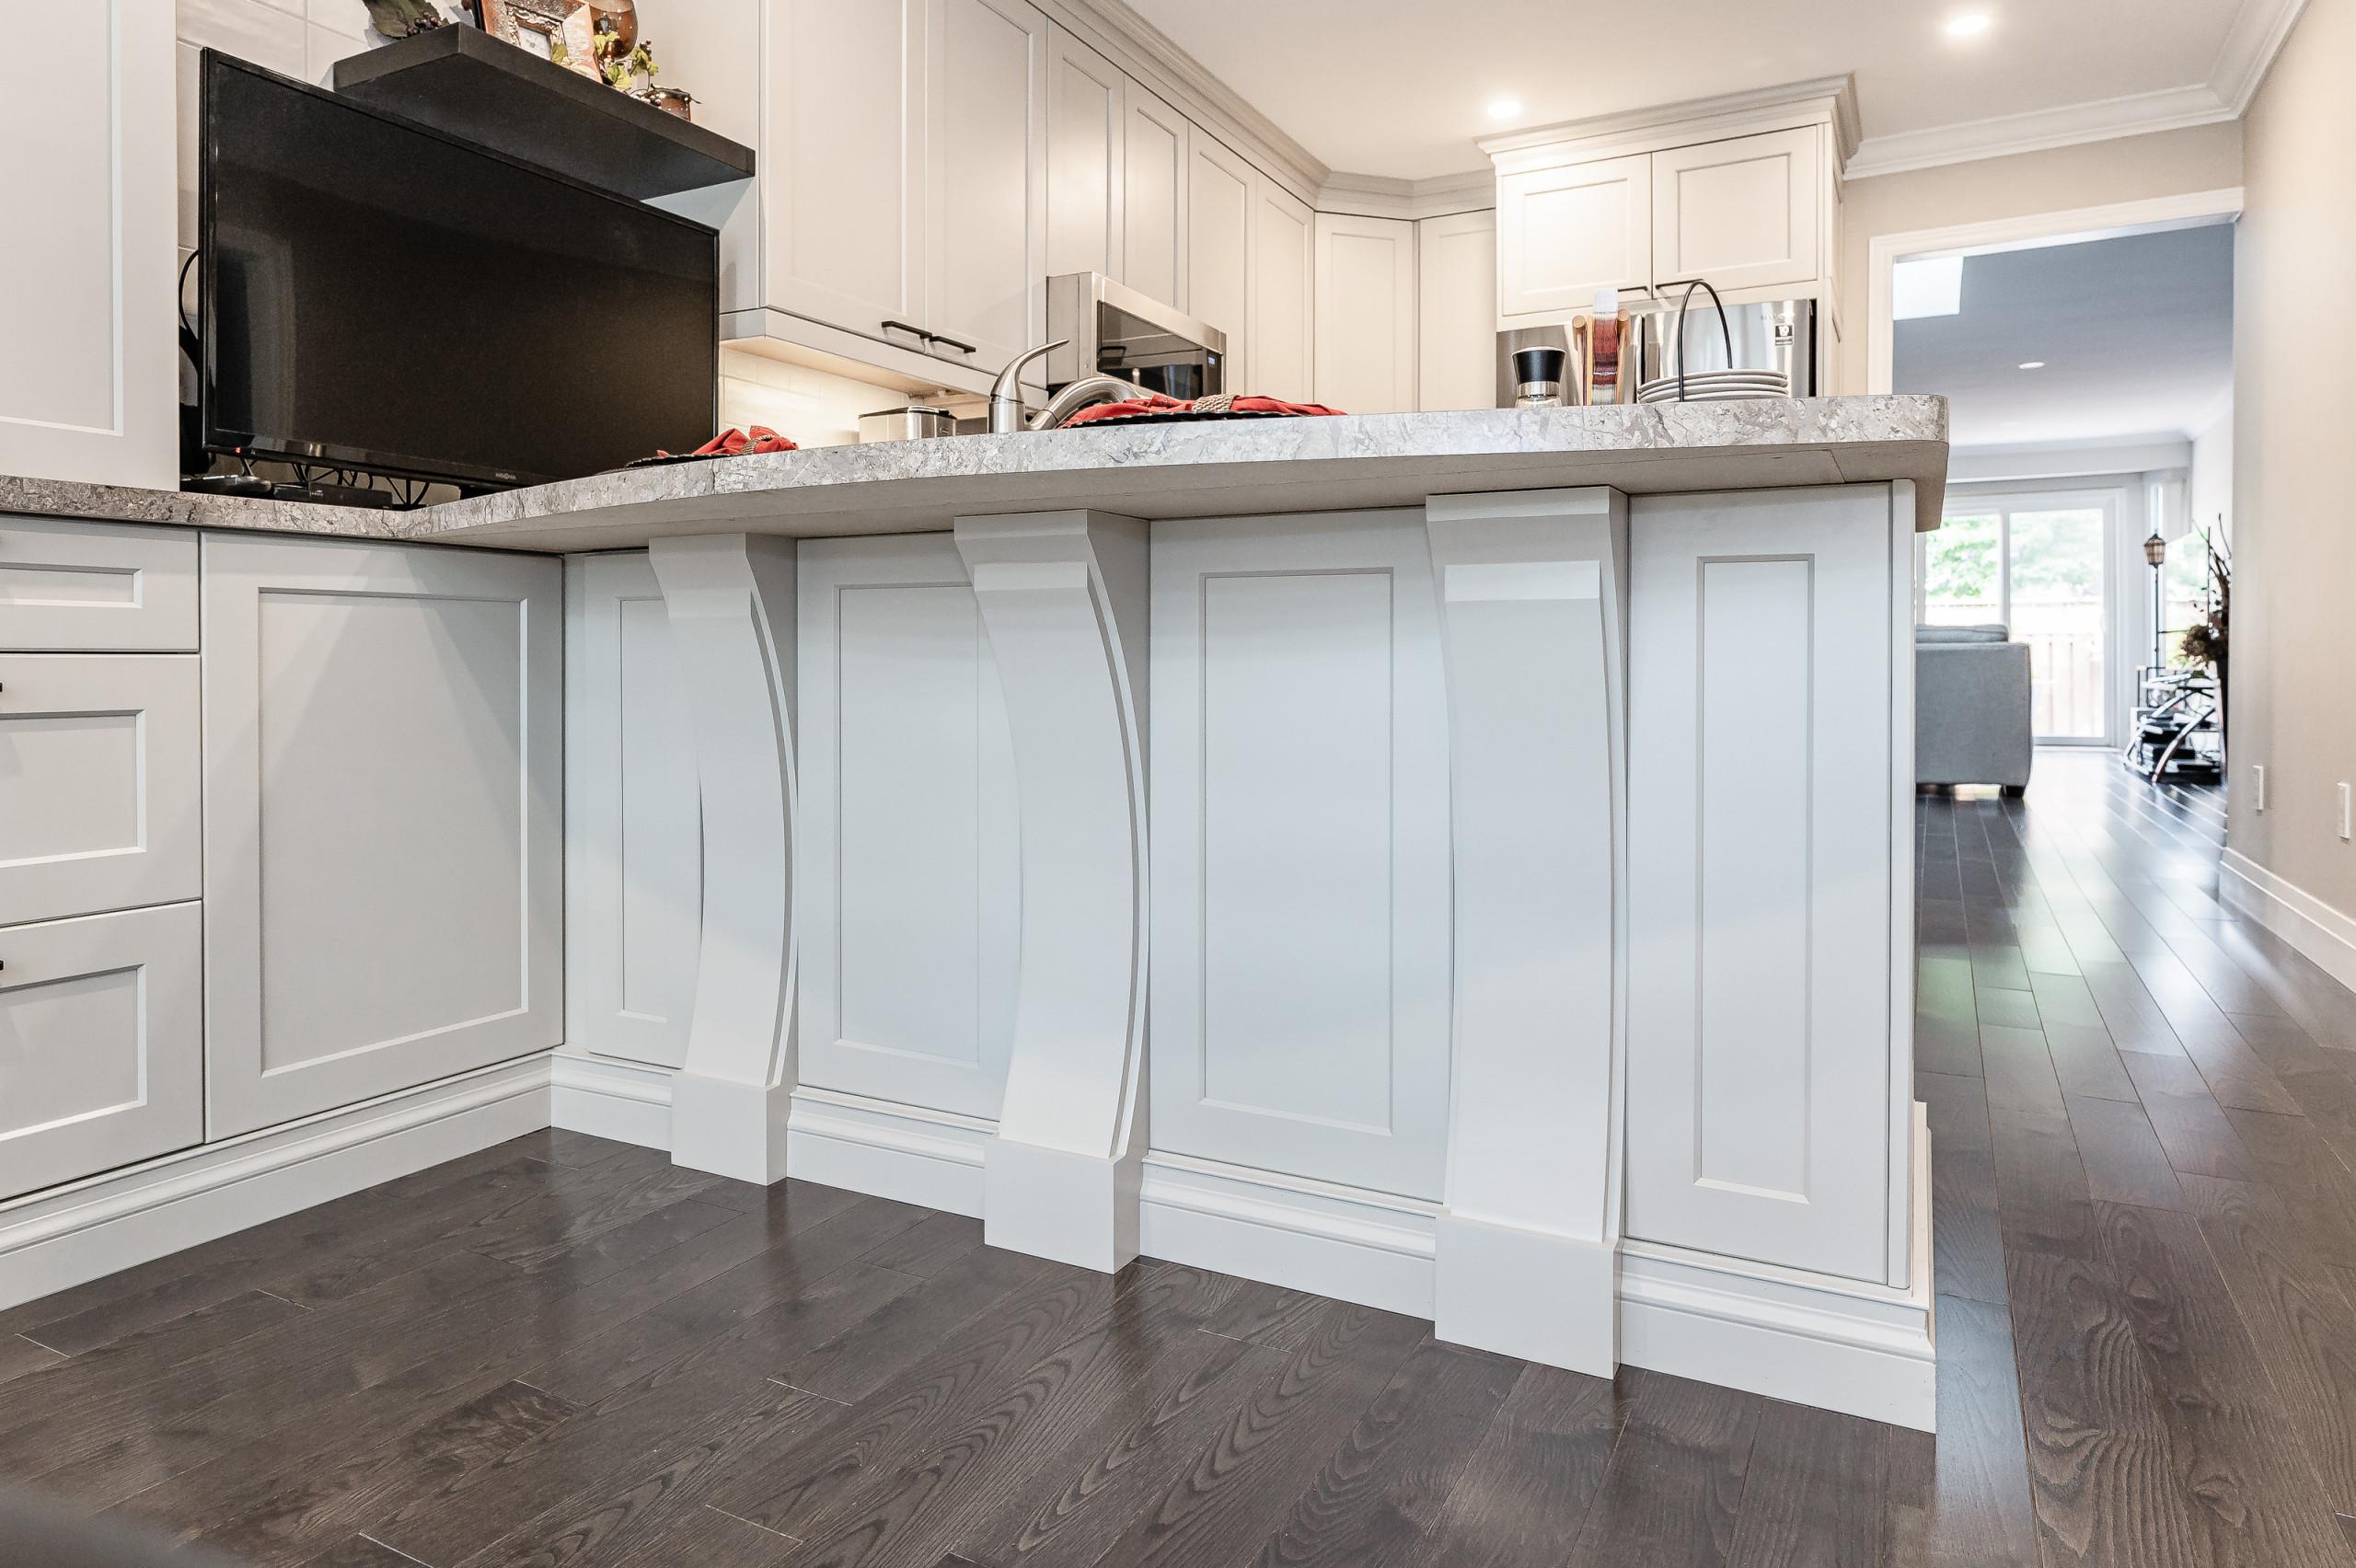 Lakeshore kitchen project